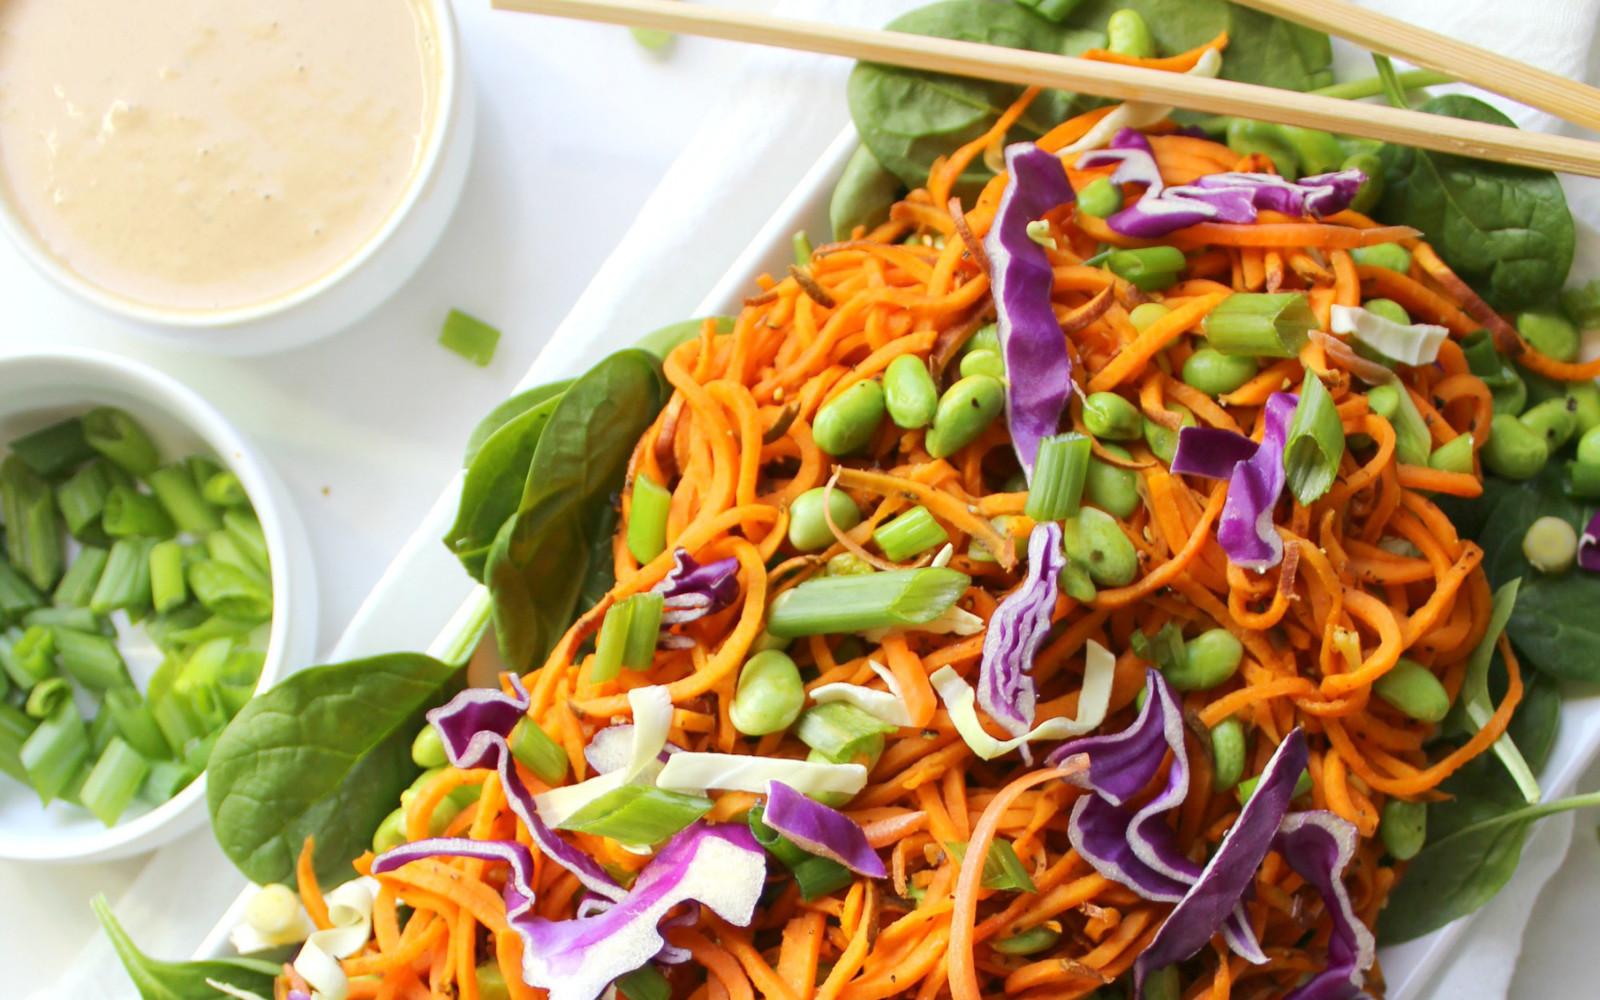 Sweet Potato Noodle Salad With Peanut Dressing